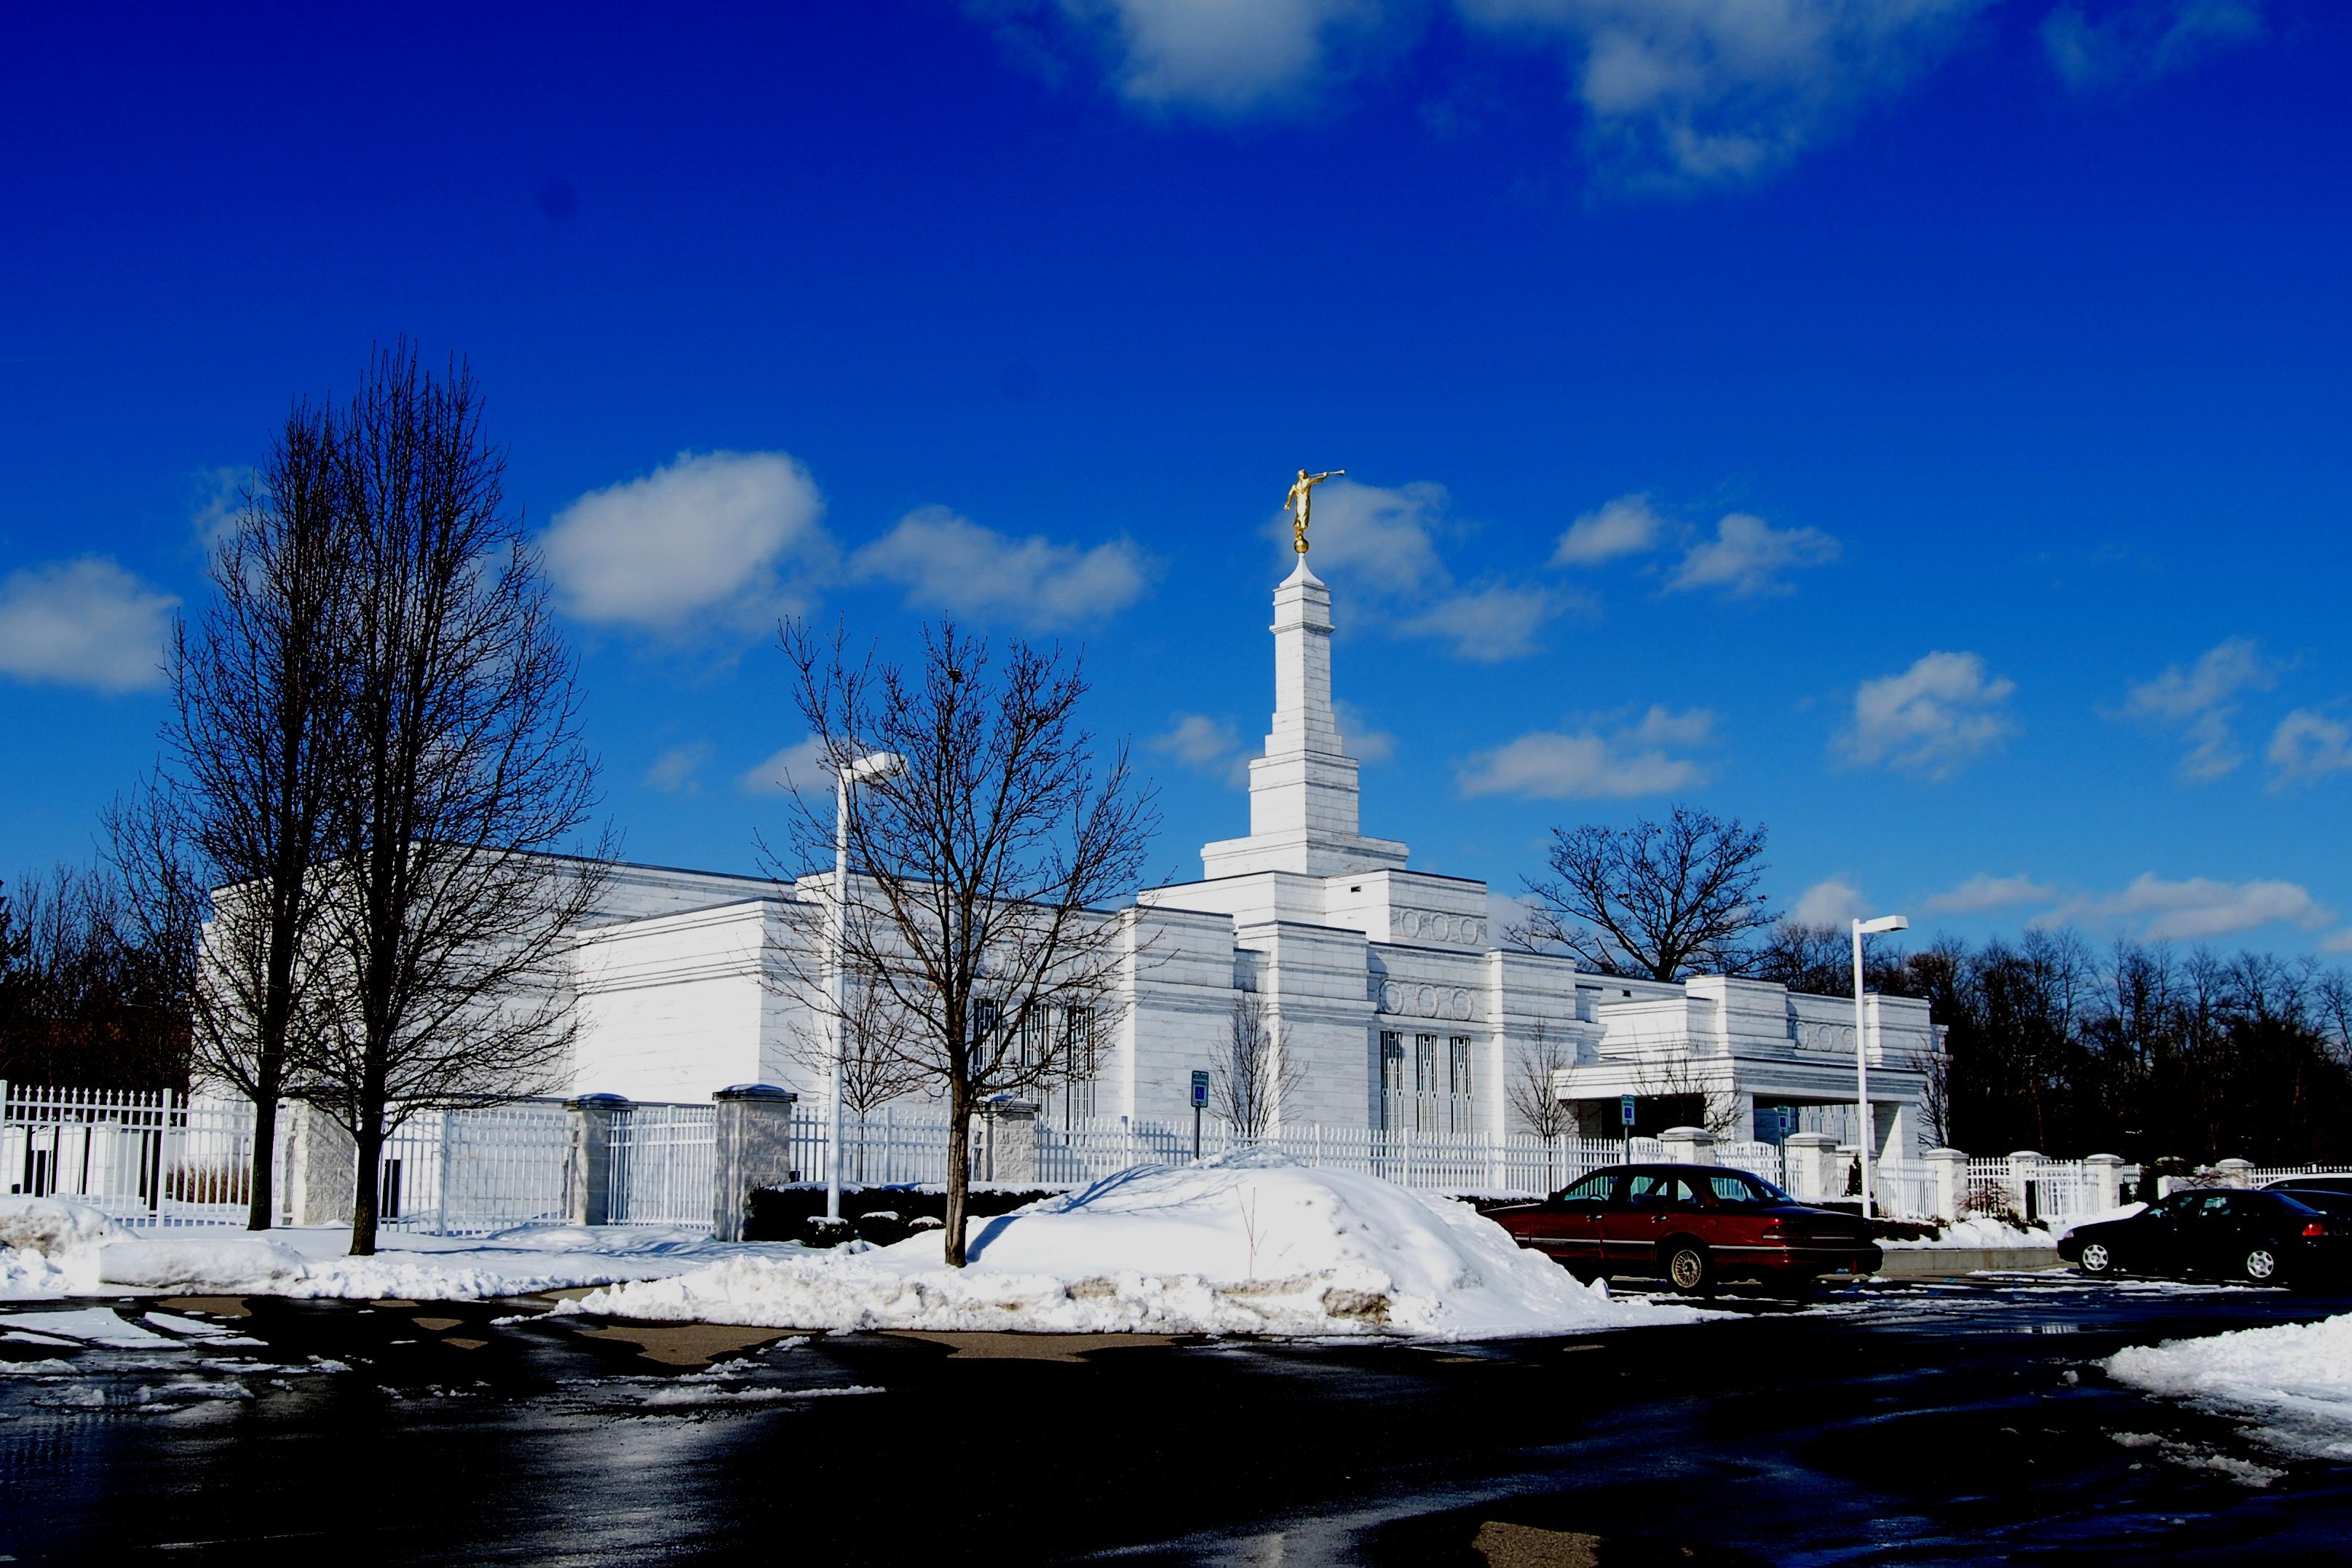 The Church of Jesus Christ of Latter-day Saints in Michigan - Wikipedia